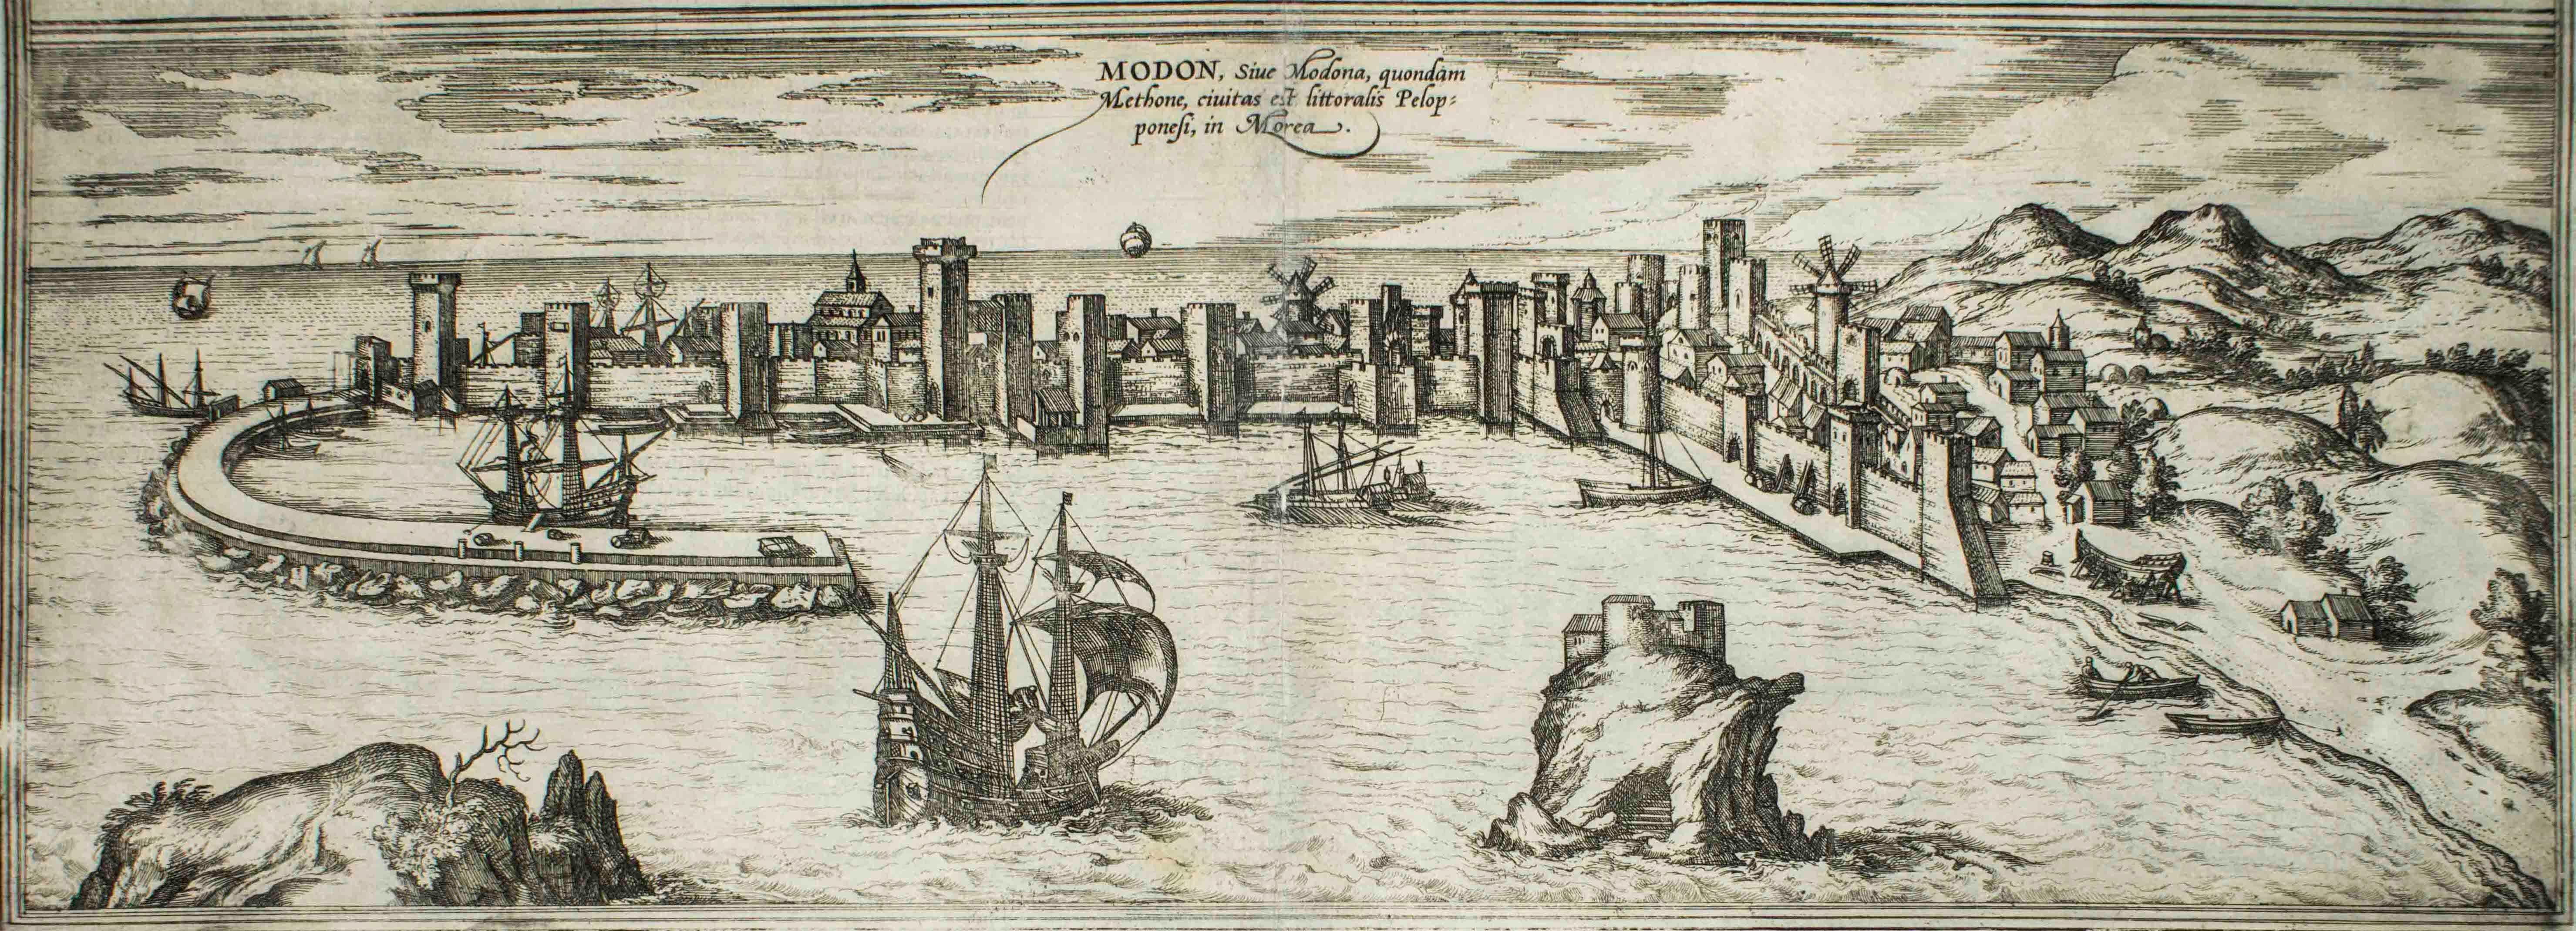 "Modon, Map from ""Civitates Orbis Terrarum"" - by F. Hogenberg - 1575"